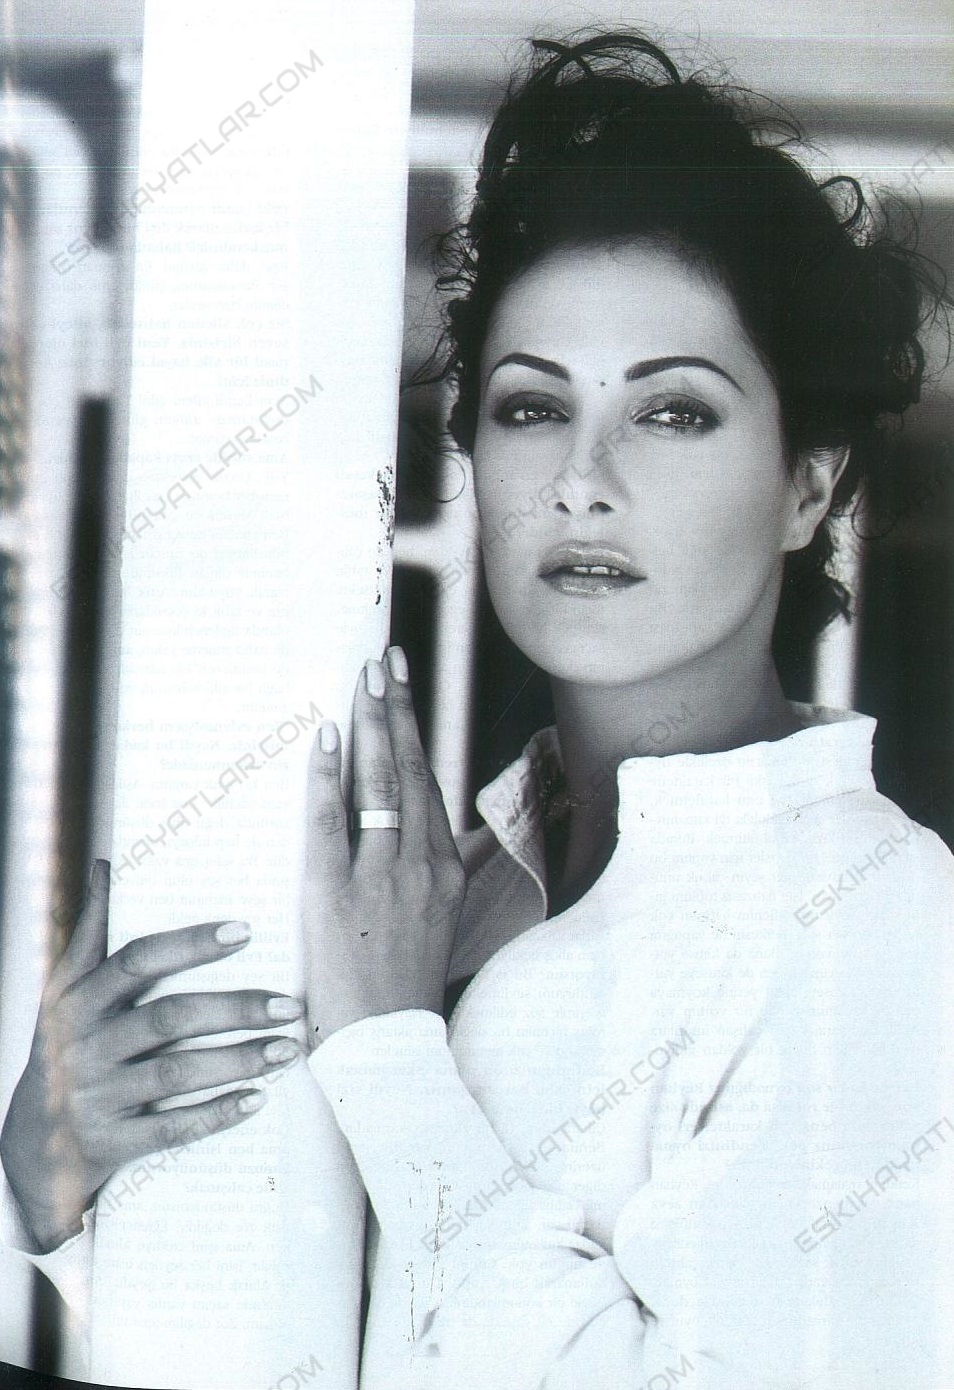 meltem-cumbul-roportaji-abdulhamit-duserken-karisik-pizza-filmi-2003-vizyon-dergisi (5)